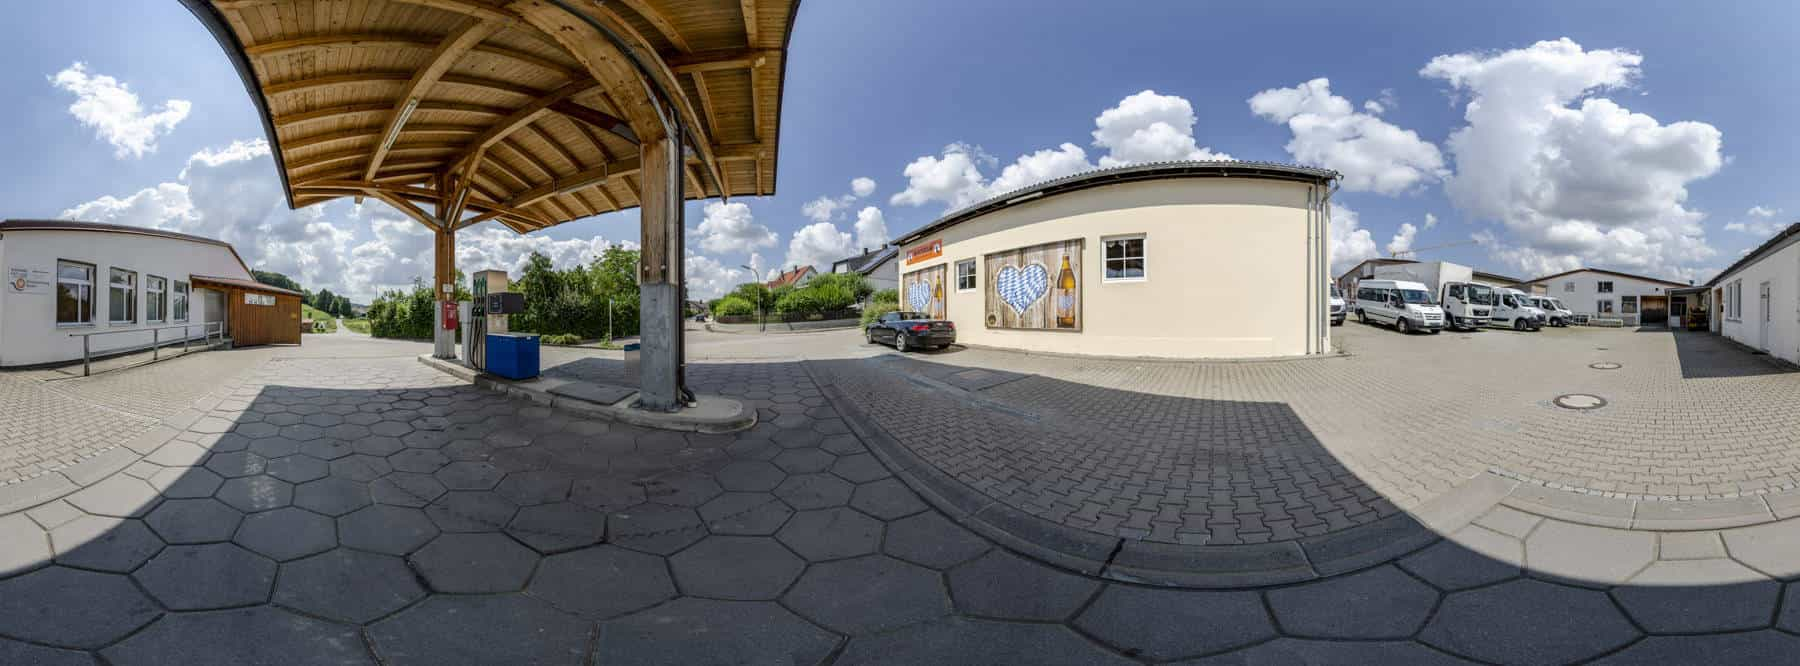 Tankstelle Gerolsbach 360°